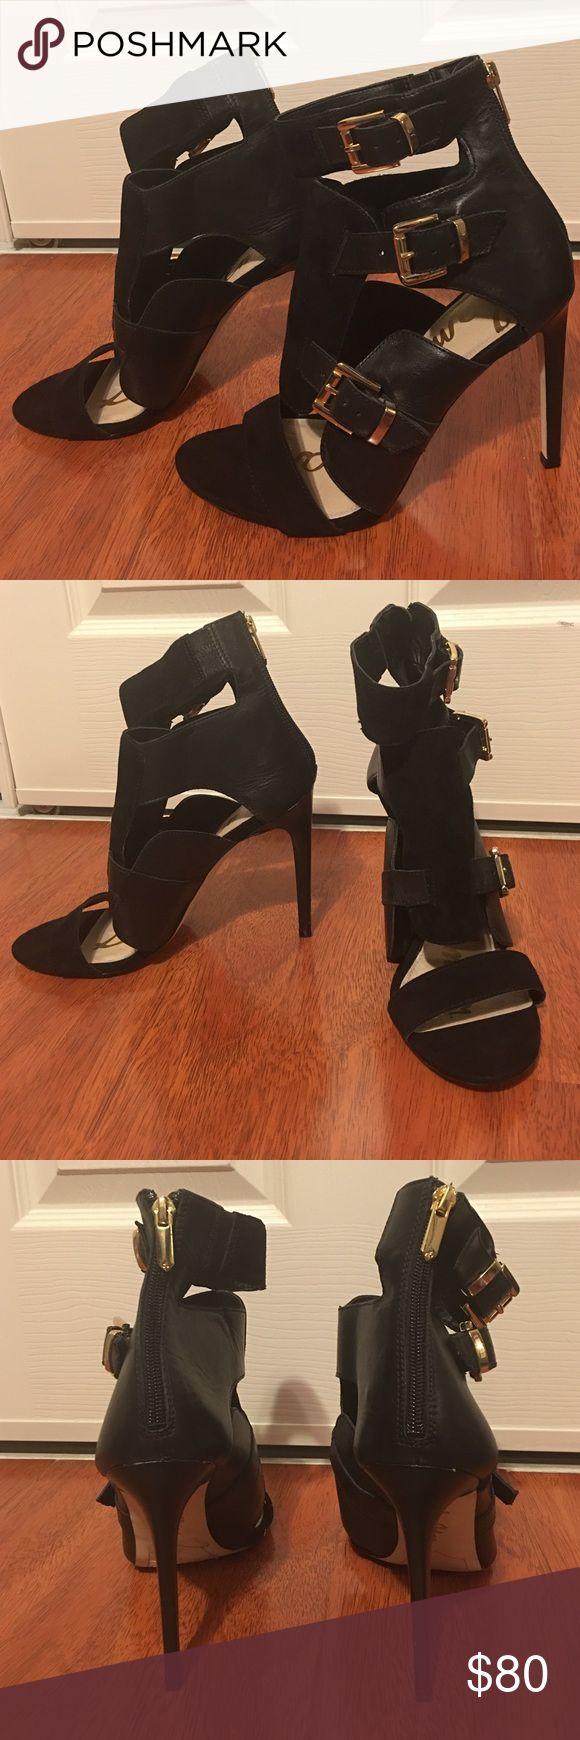 (1 Day Sale🎉) Sam Edelman Black Heels!Never worn Sam Edelman Black Heels!! Excellent condition!! Sam Edelman Shoes Heels